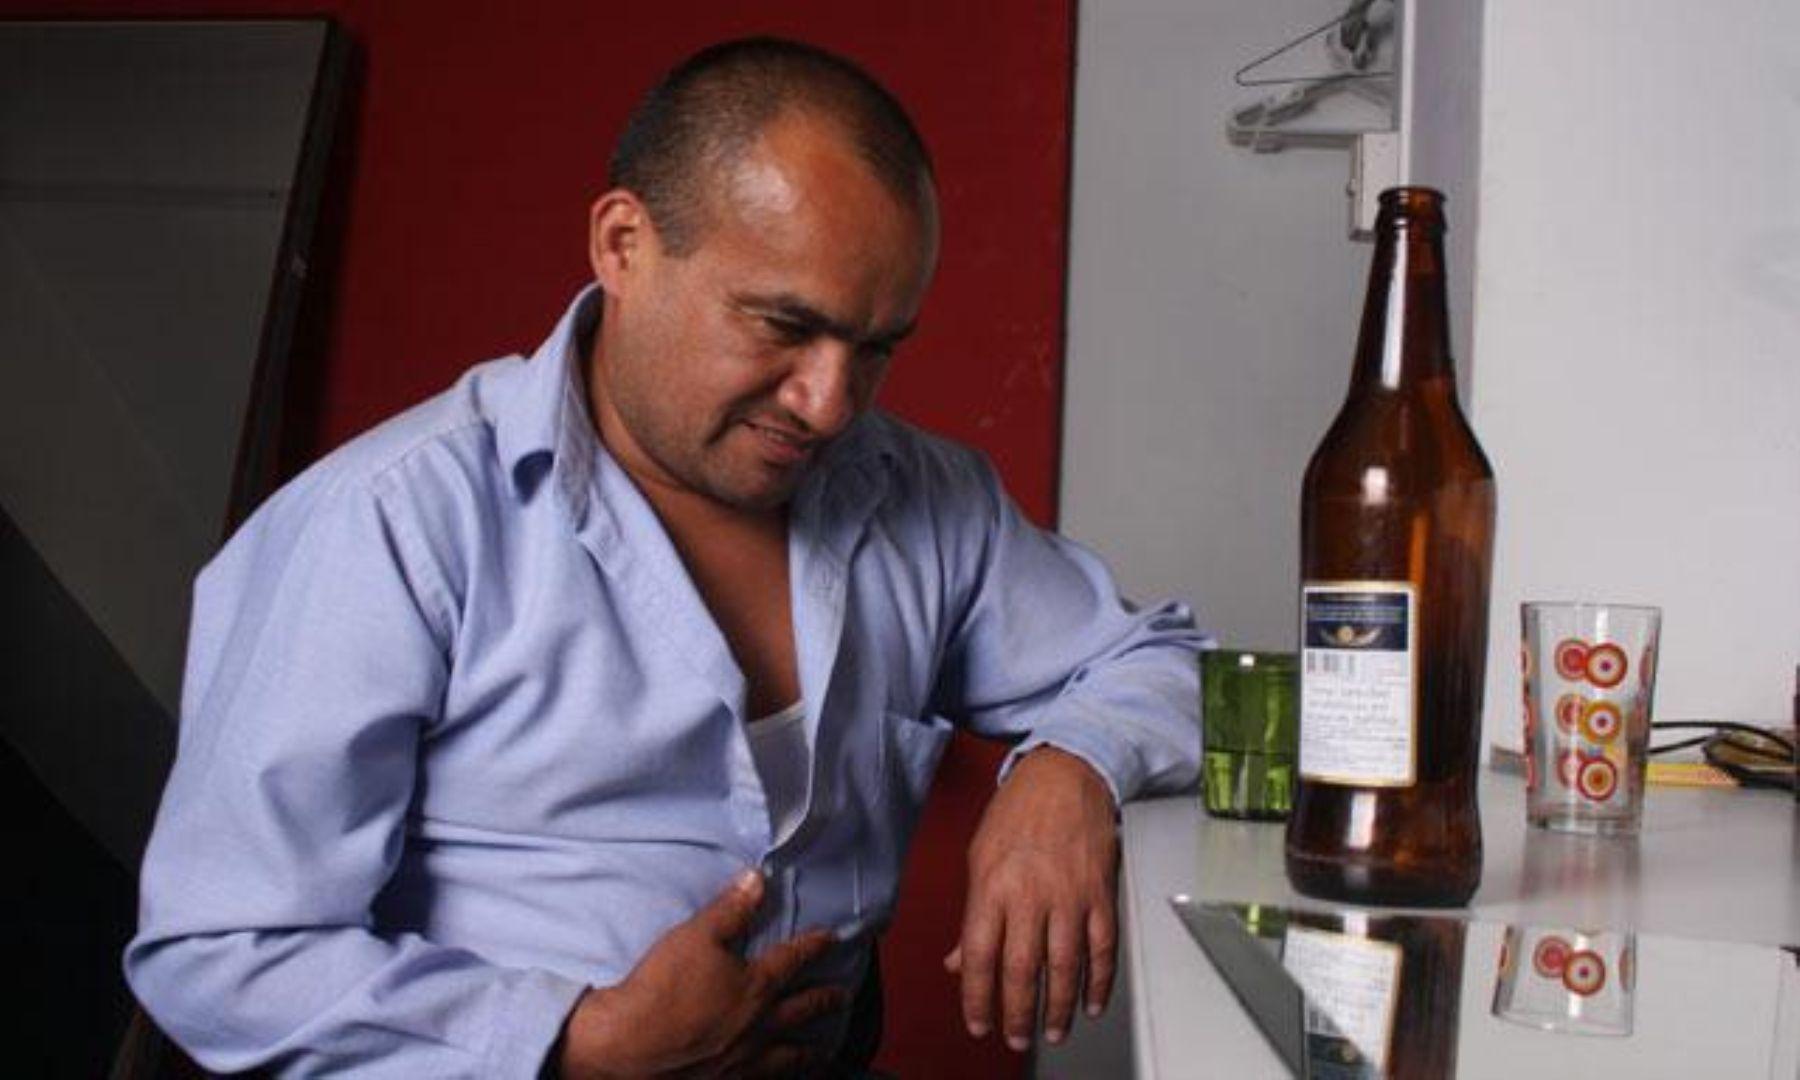 Алкоголь при гастрите: можно ли пить алкоголь при гастрите желудка